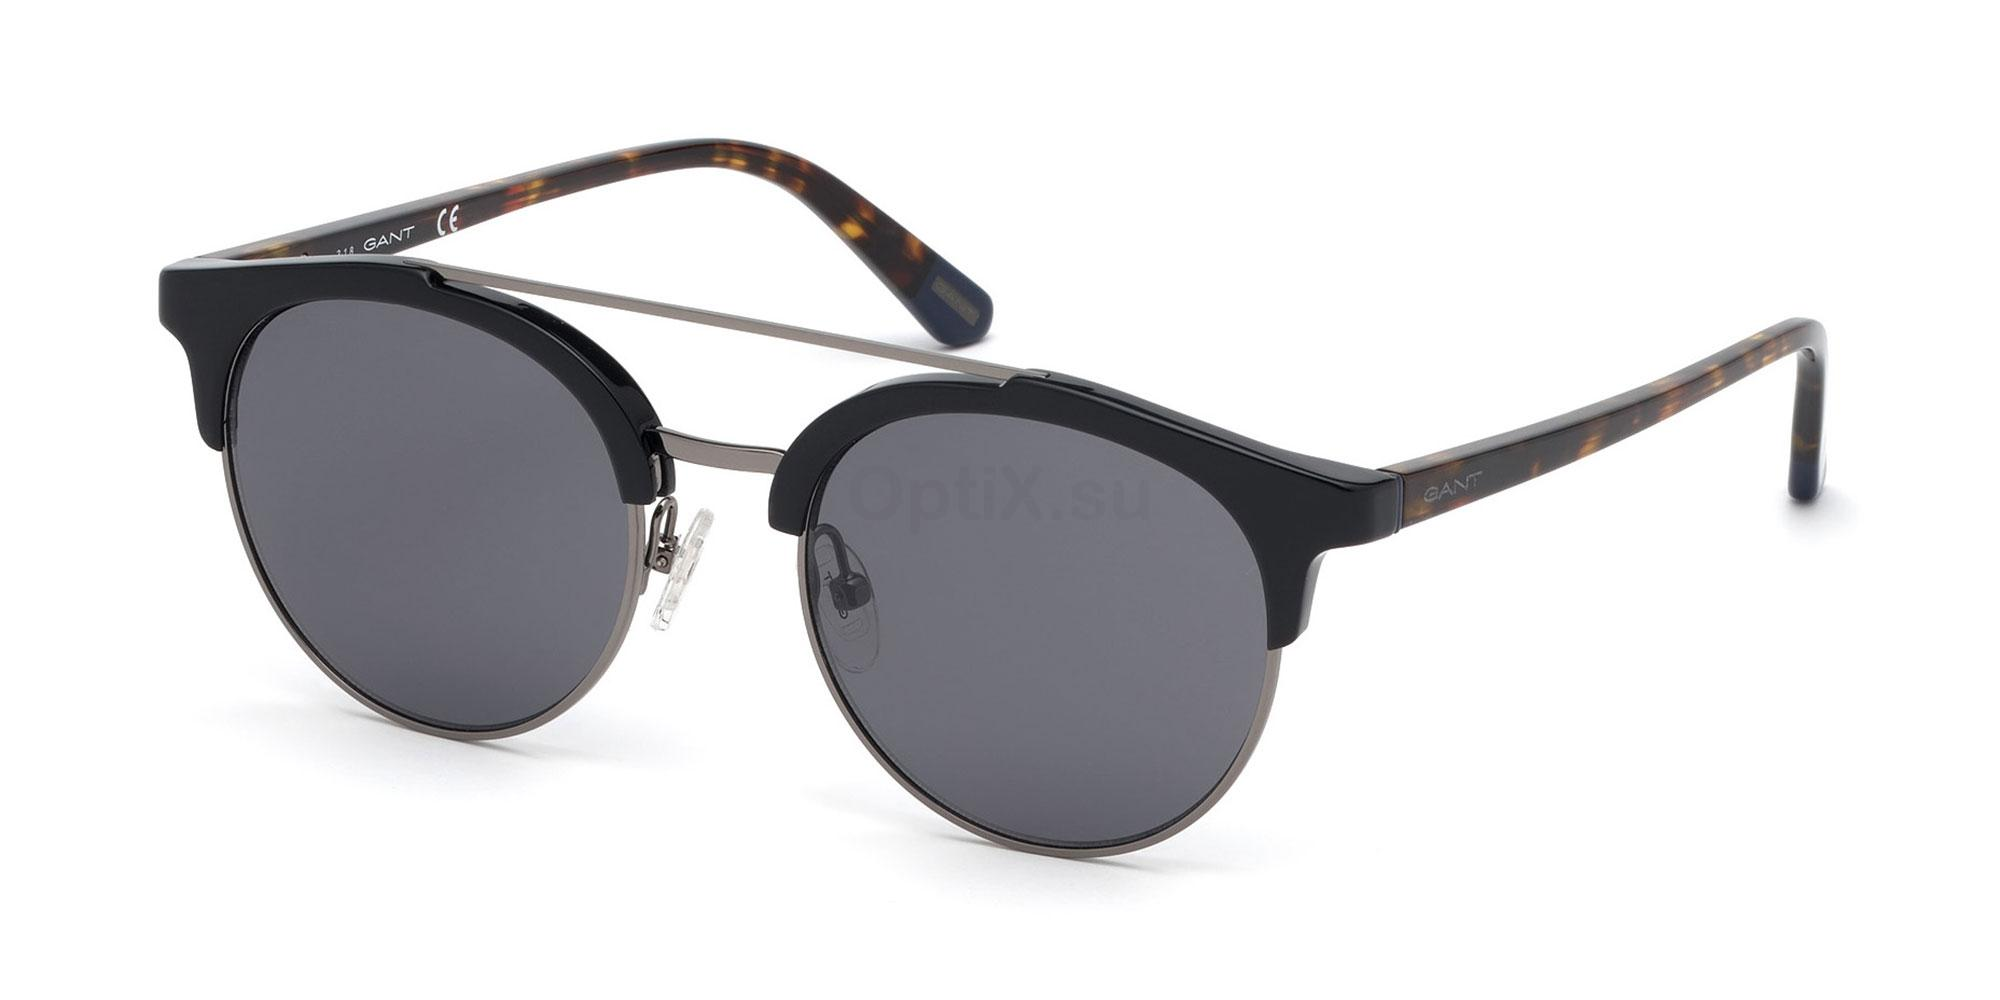 01A GA7112 Sunglasses, Gant